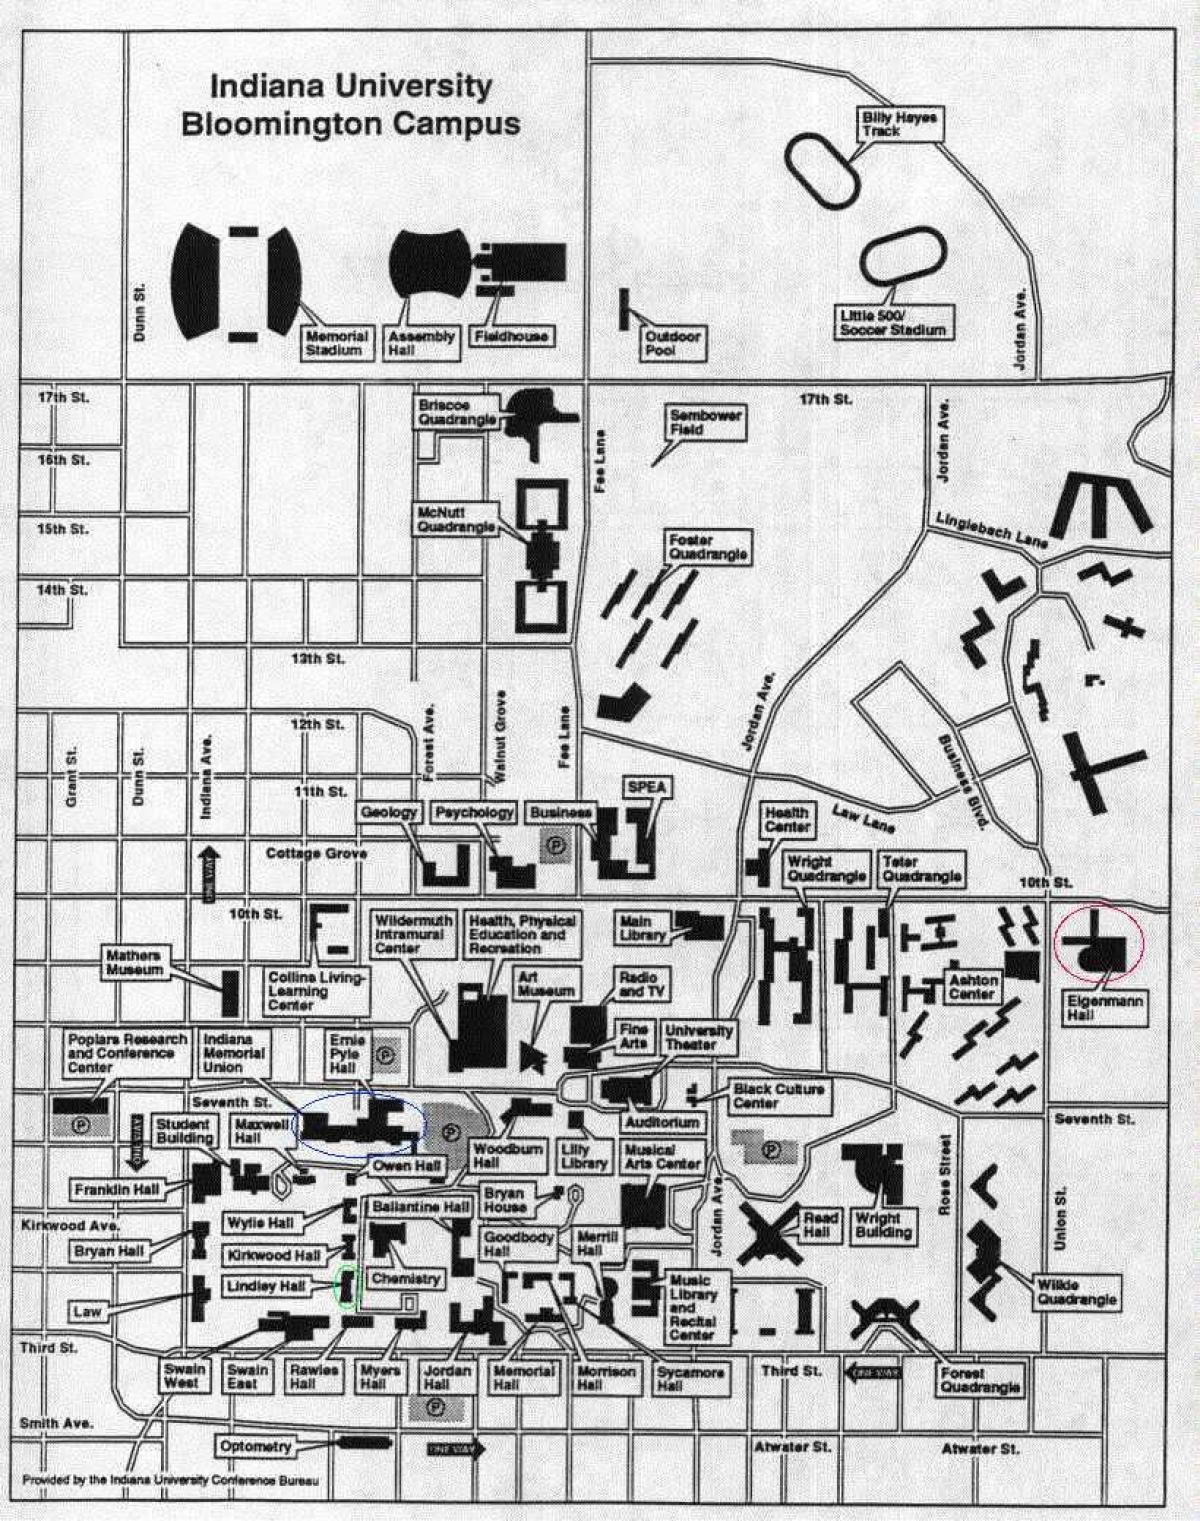 Indiana University Bloomington Map : indiana, university, bloomington, Indiana, University, Bloomington, Campus